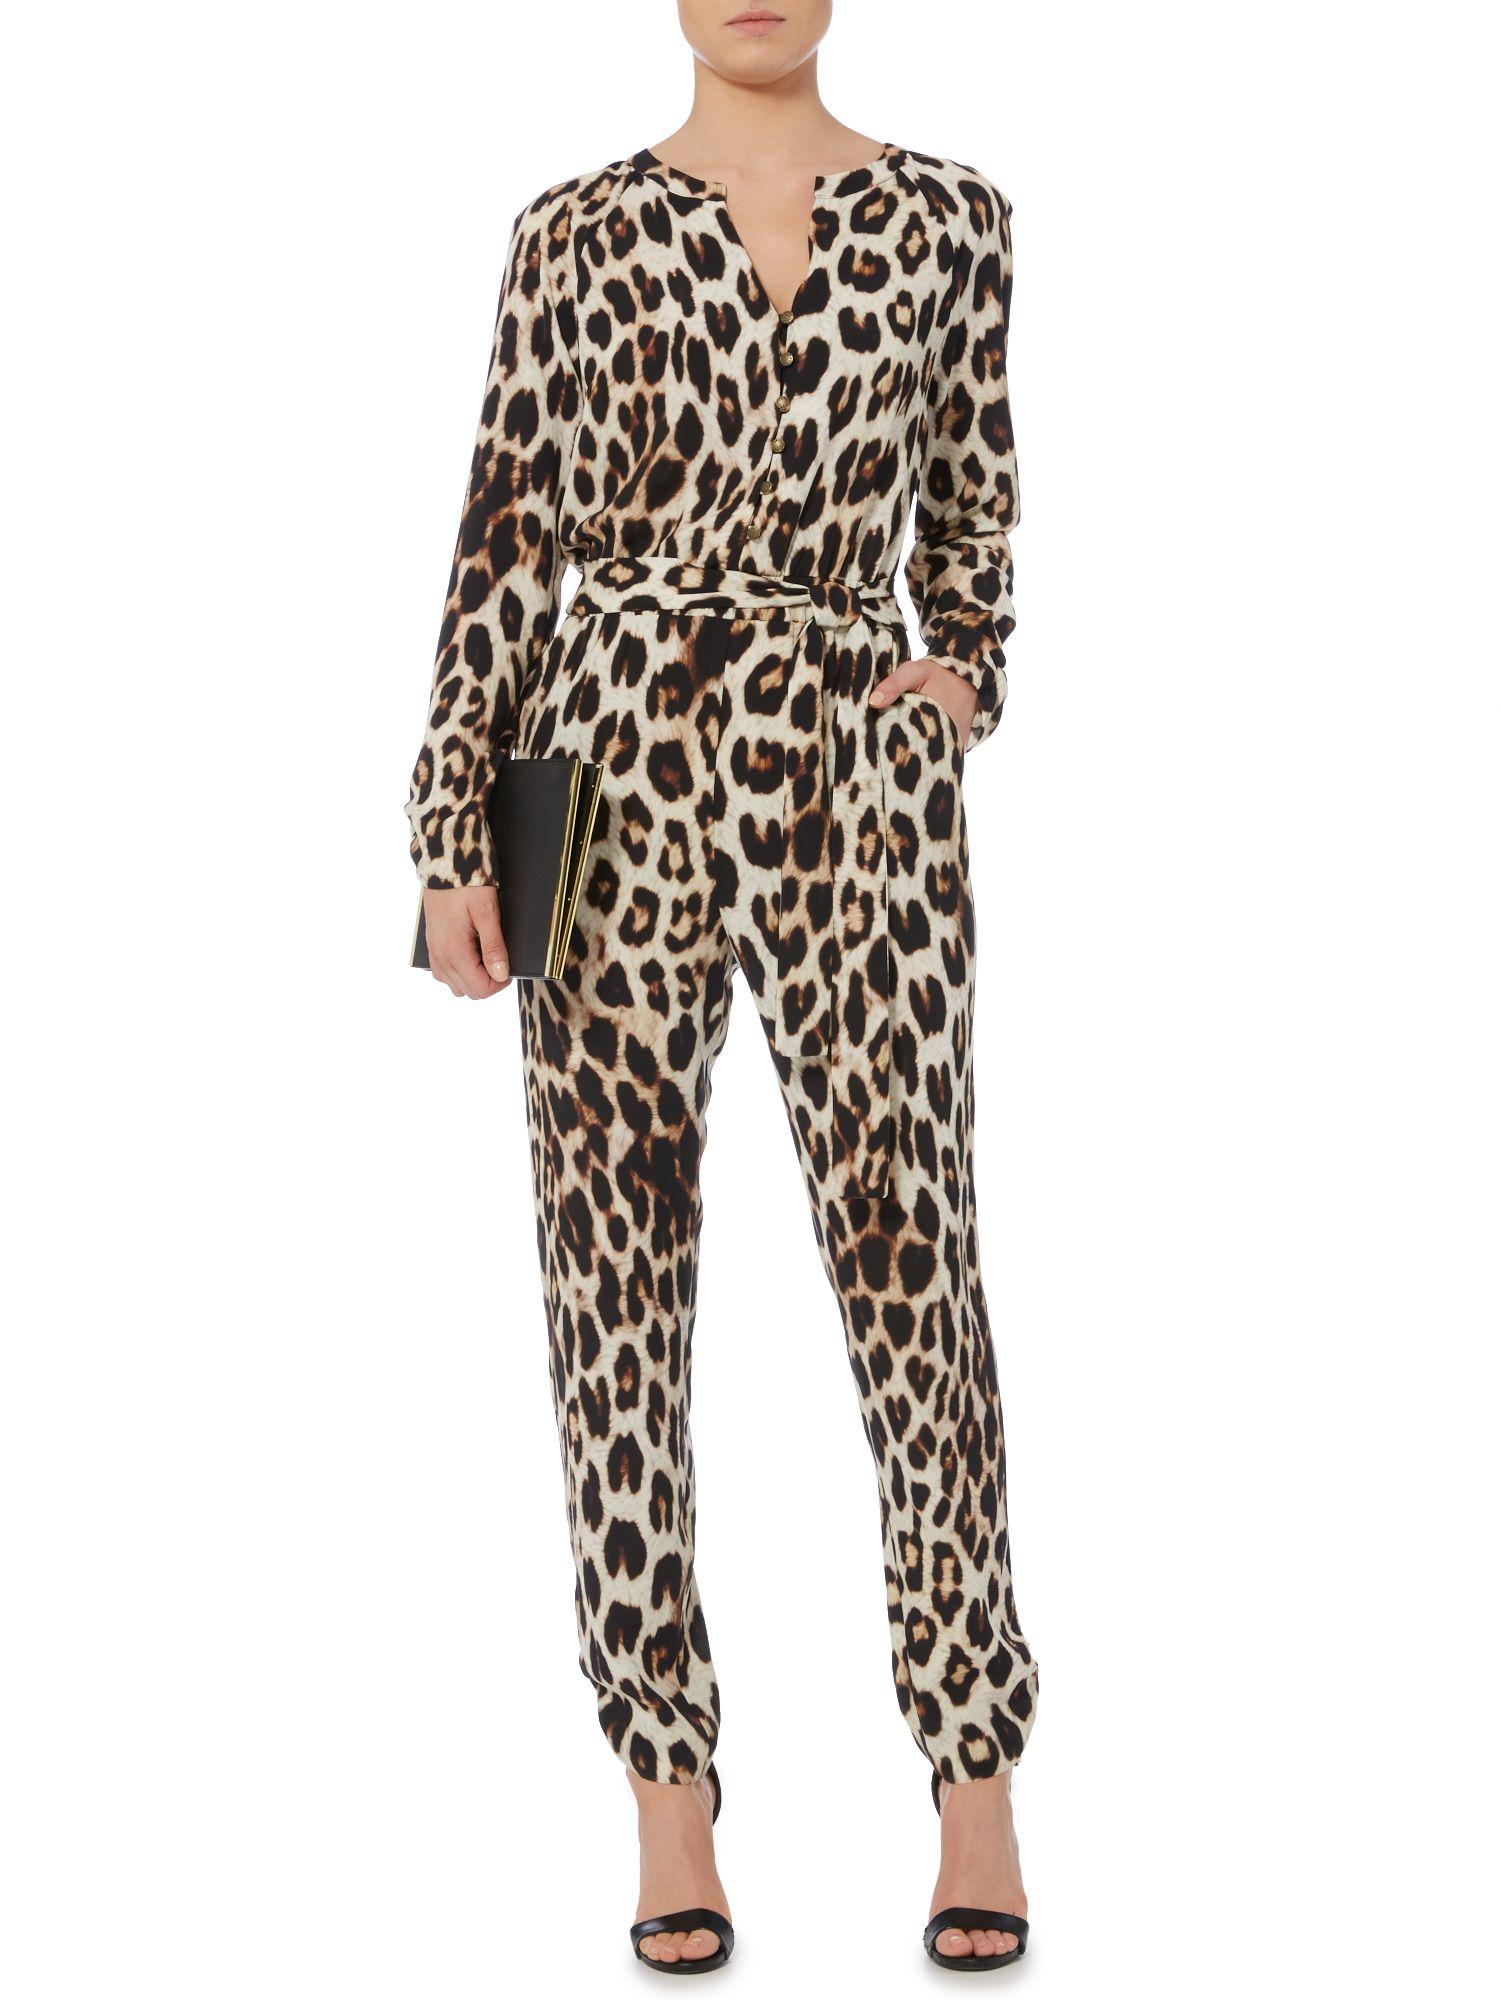 Biba Leopard Print Jum...